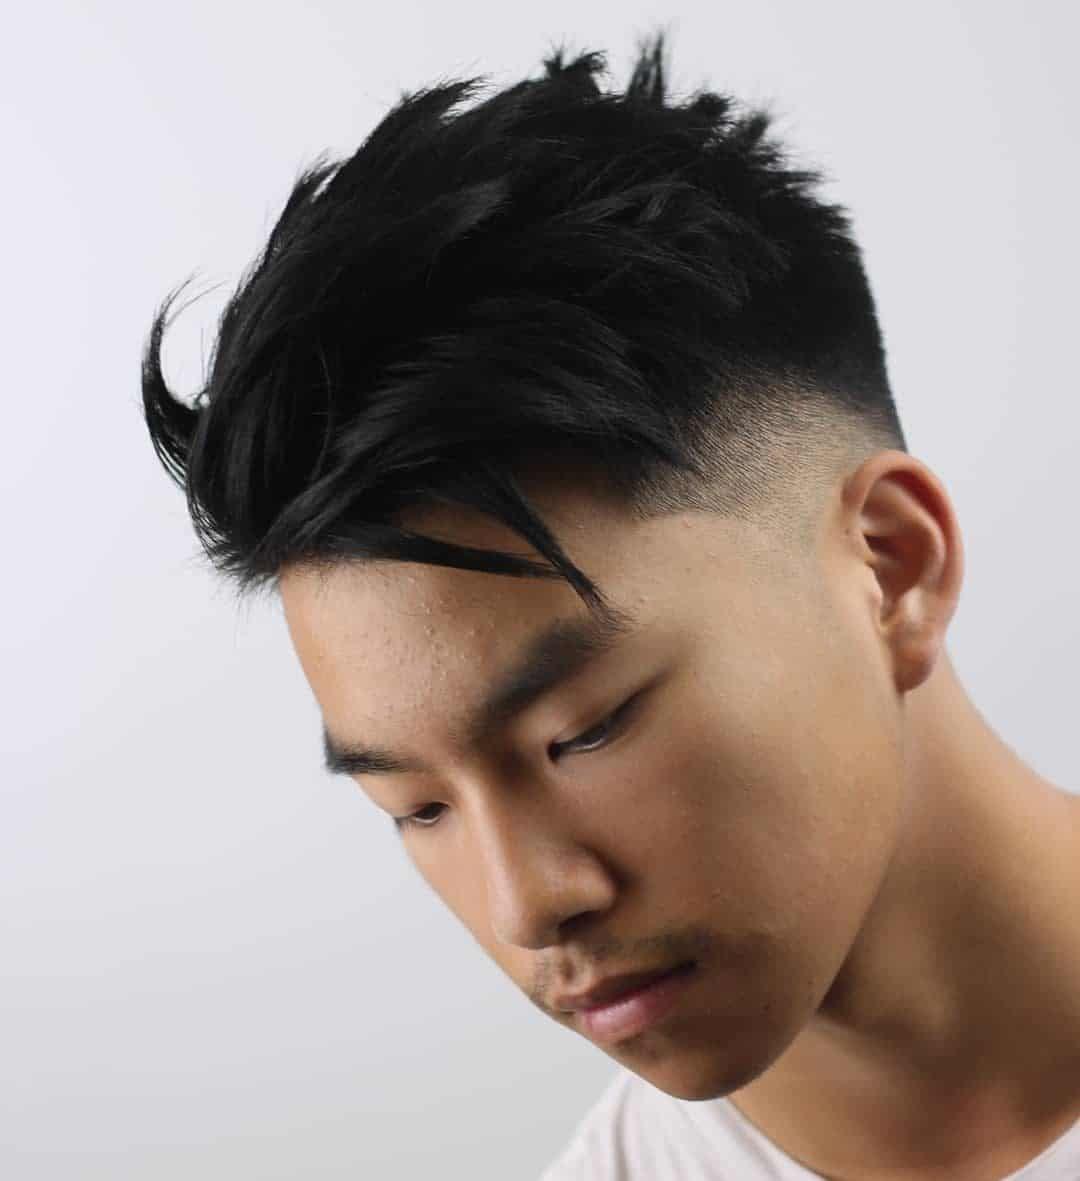 29 Best Hairstyles For Asian Men (2020 Styles) | Asian men hairstyle, Asian man haircut, Asian hair